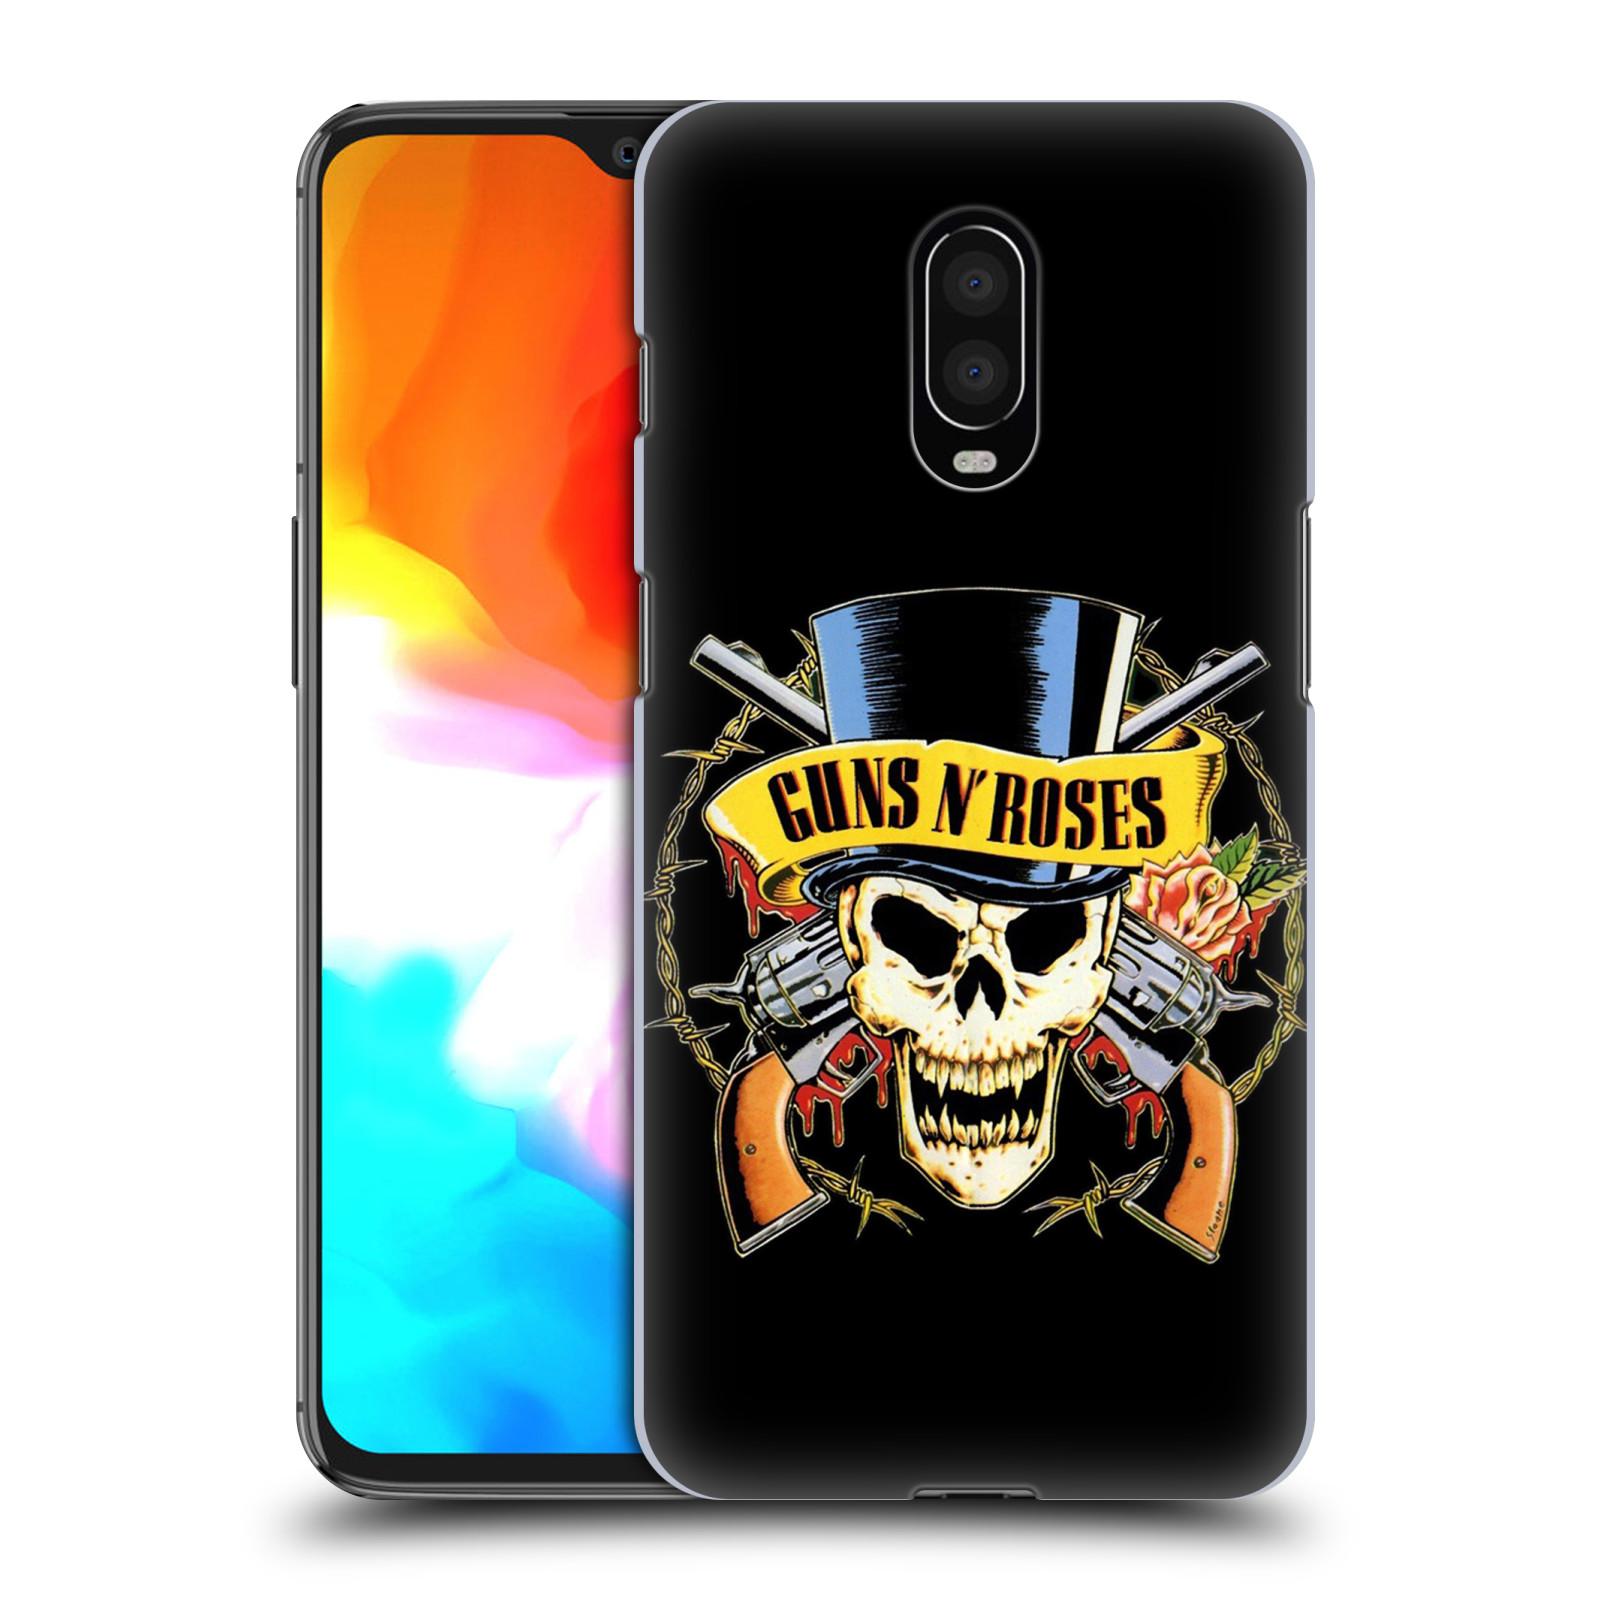 Plastové pouzdro na mobil OnePlus 6T - Head Case - Guns N' Roses - Lebka